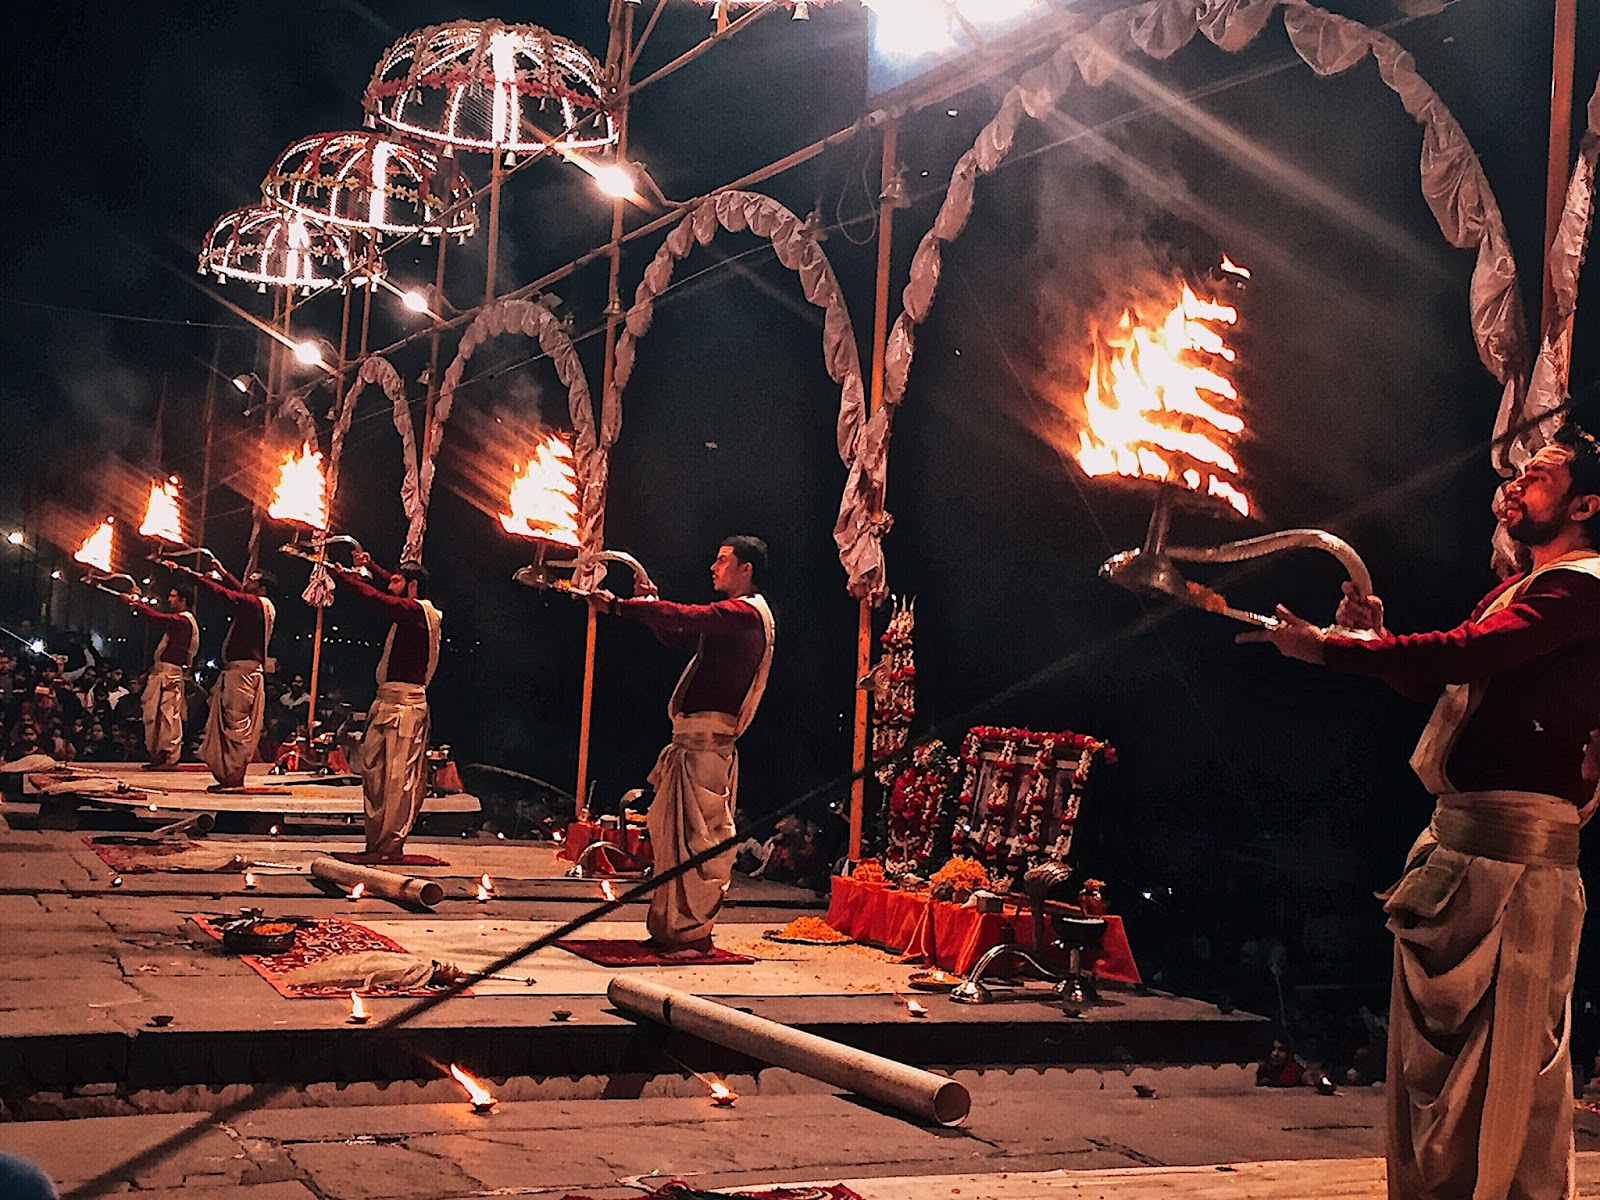 ganga arti,varanasi travel guide, vranasai information, tips on varanasi, travel varanasi, spiritual capital of india, city of temples, indian travel blogger, uk blog, benares travel